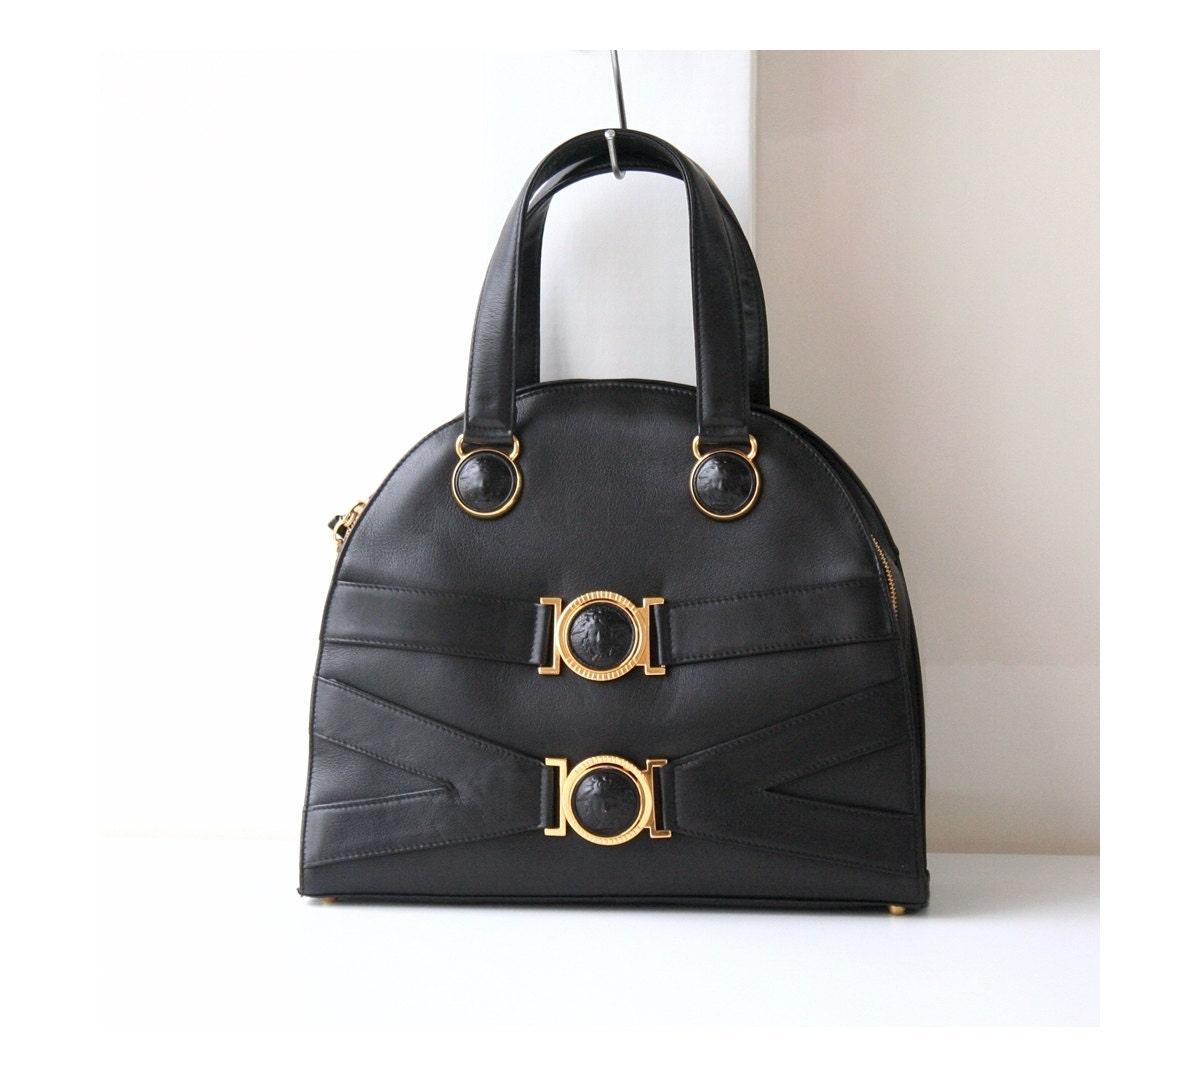 Gianni Versace Bag Black Medusa Leather Tote Authentic Vintage  ec2ff7f5fccac